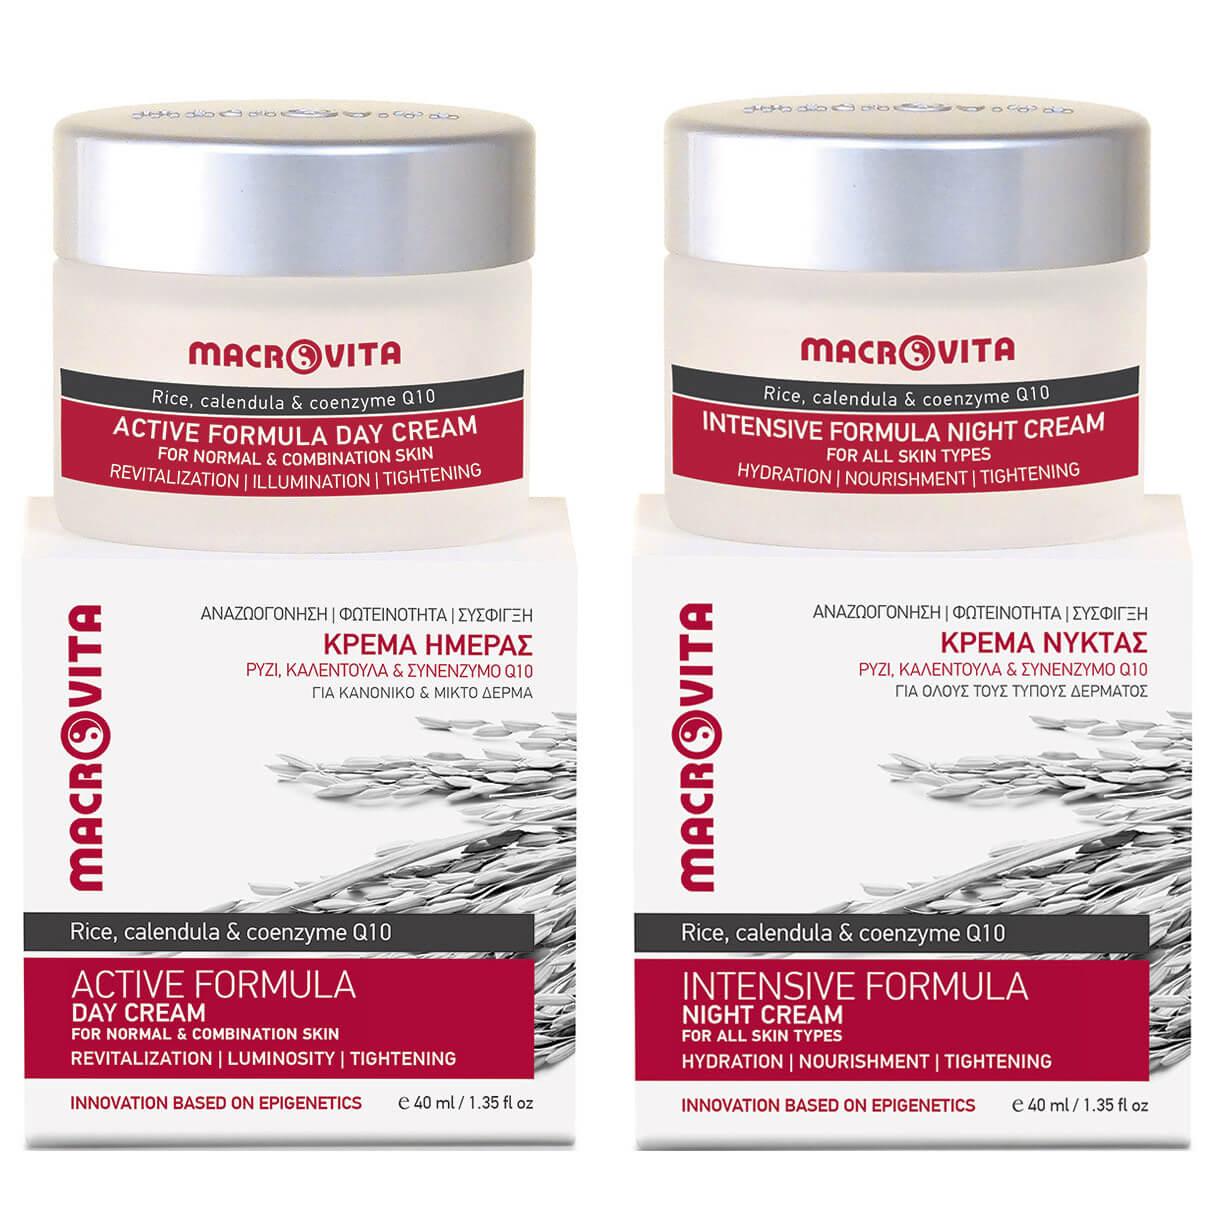 Macrovita Πακέτο Προσφοράς Active Formula Day Cream 40ml & Δώρο Intensive Formula Night Cream 40ml & Πρακτικό Νεσεσέρ